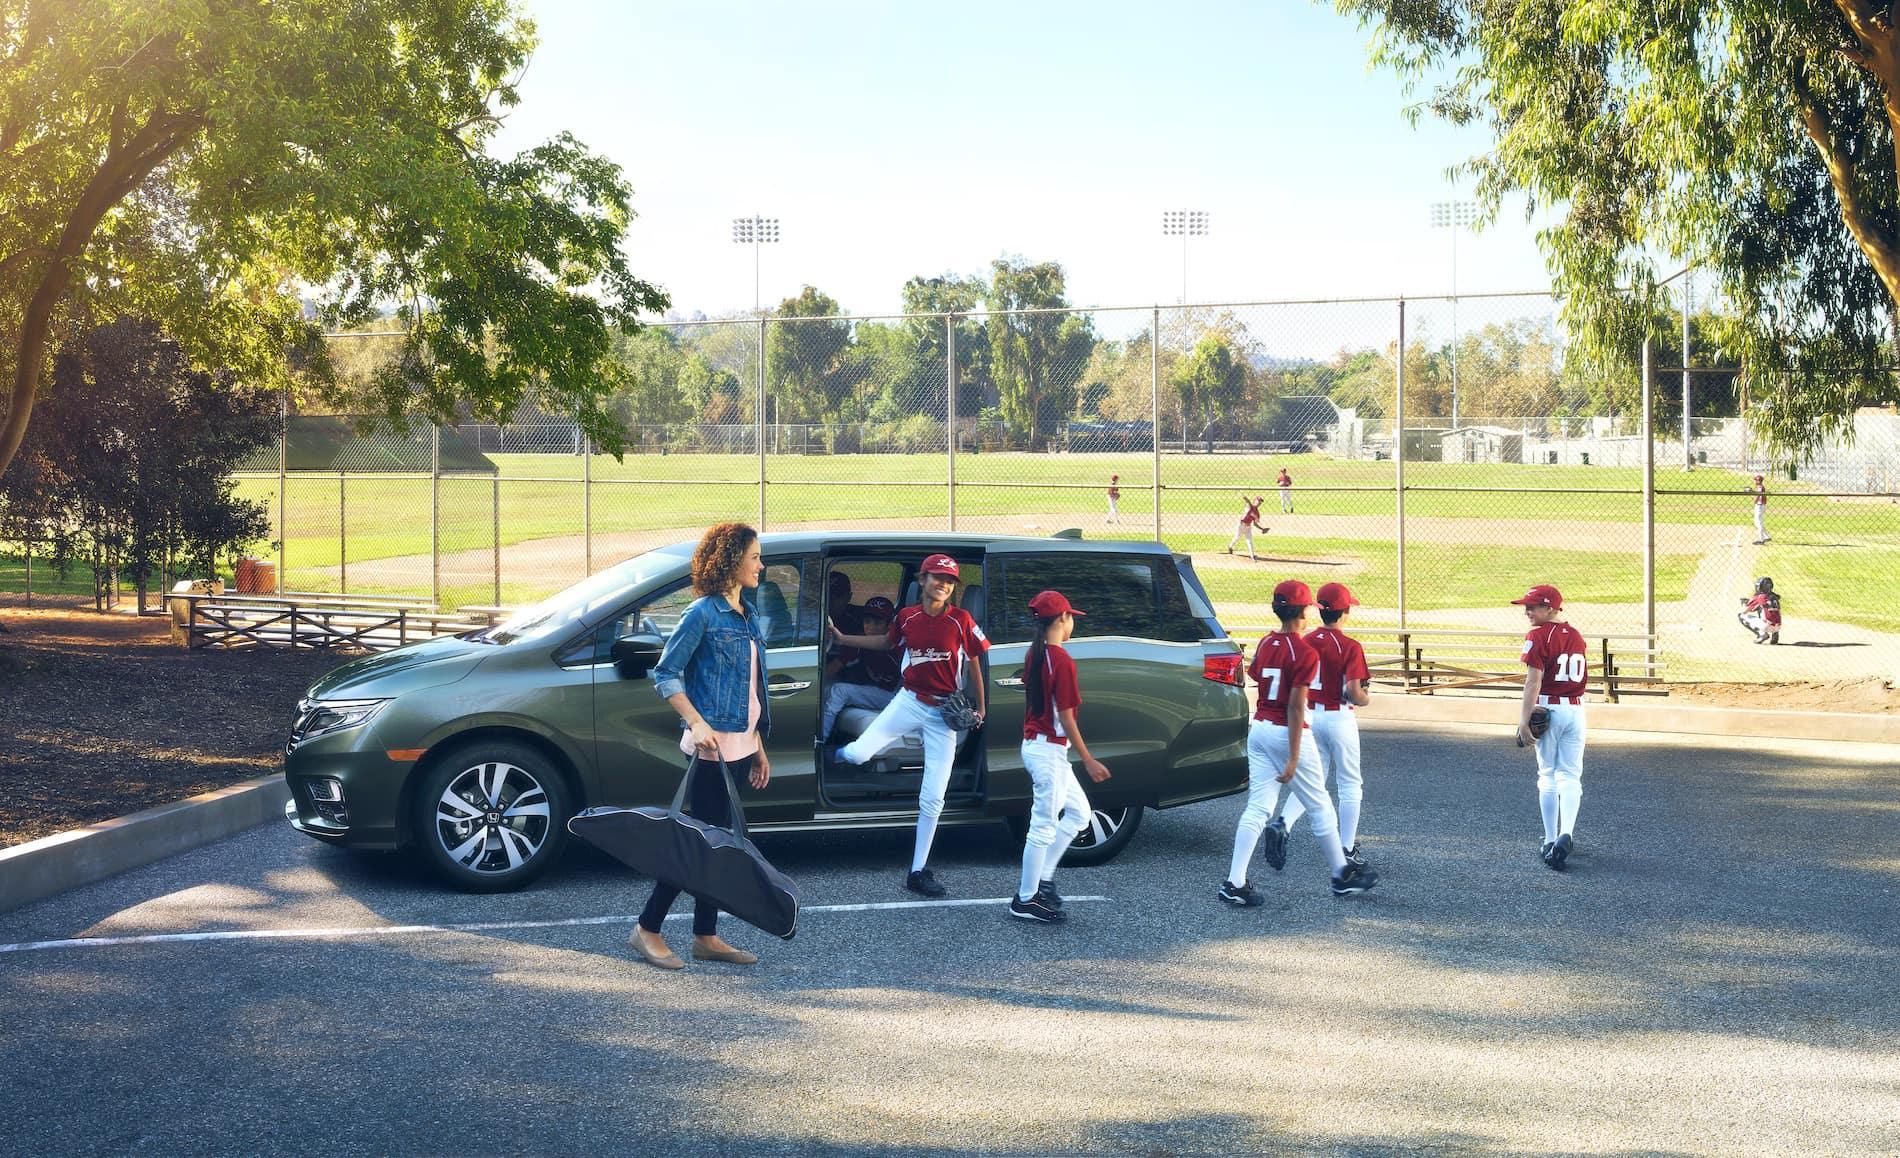 What will protect your Honda's interior at Boch Honda West of Westford | Honda parked at a kid baseball game